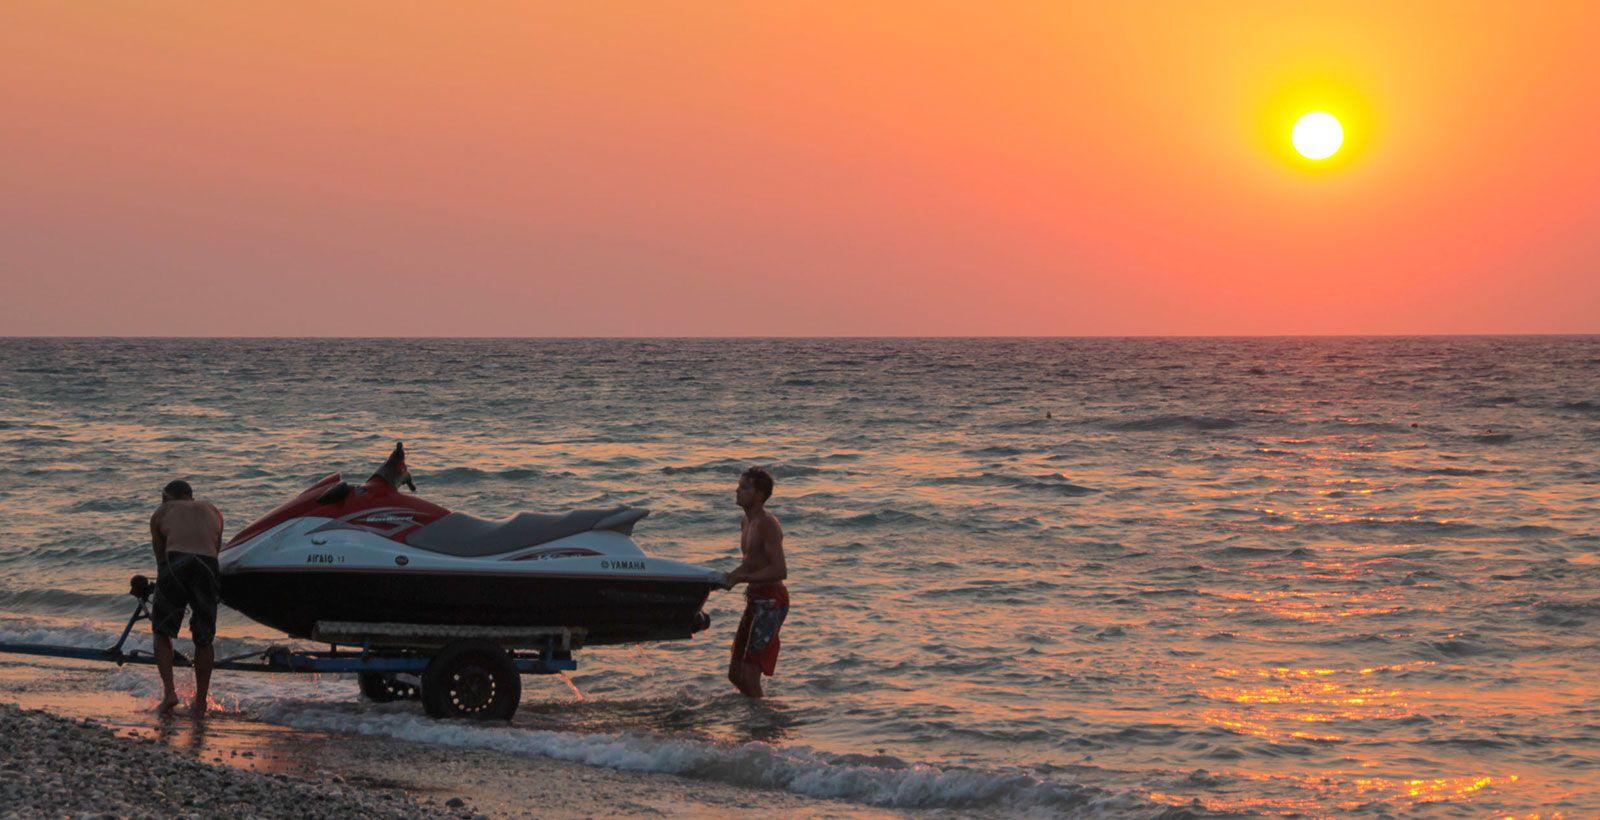 kitesurfing-kite-air-riders-kitepro-center-kremasti-rhodes-sunset-beach-jetski